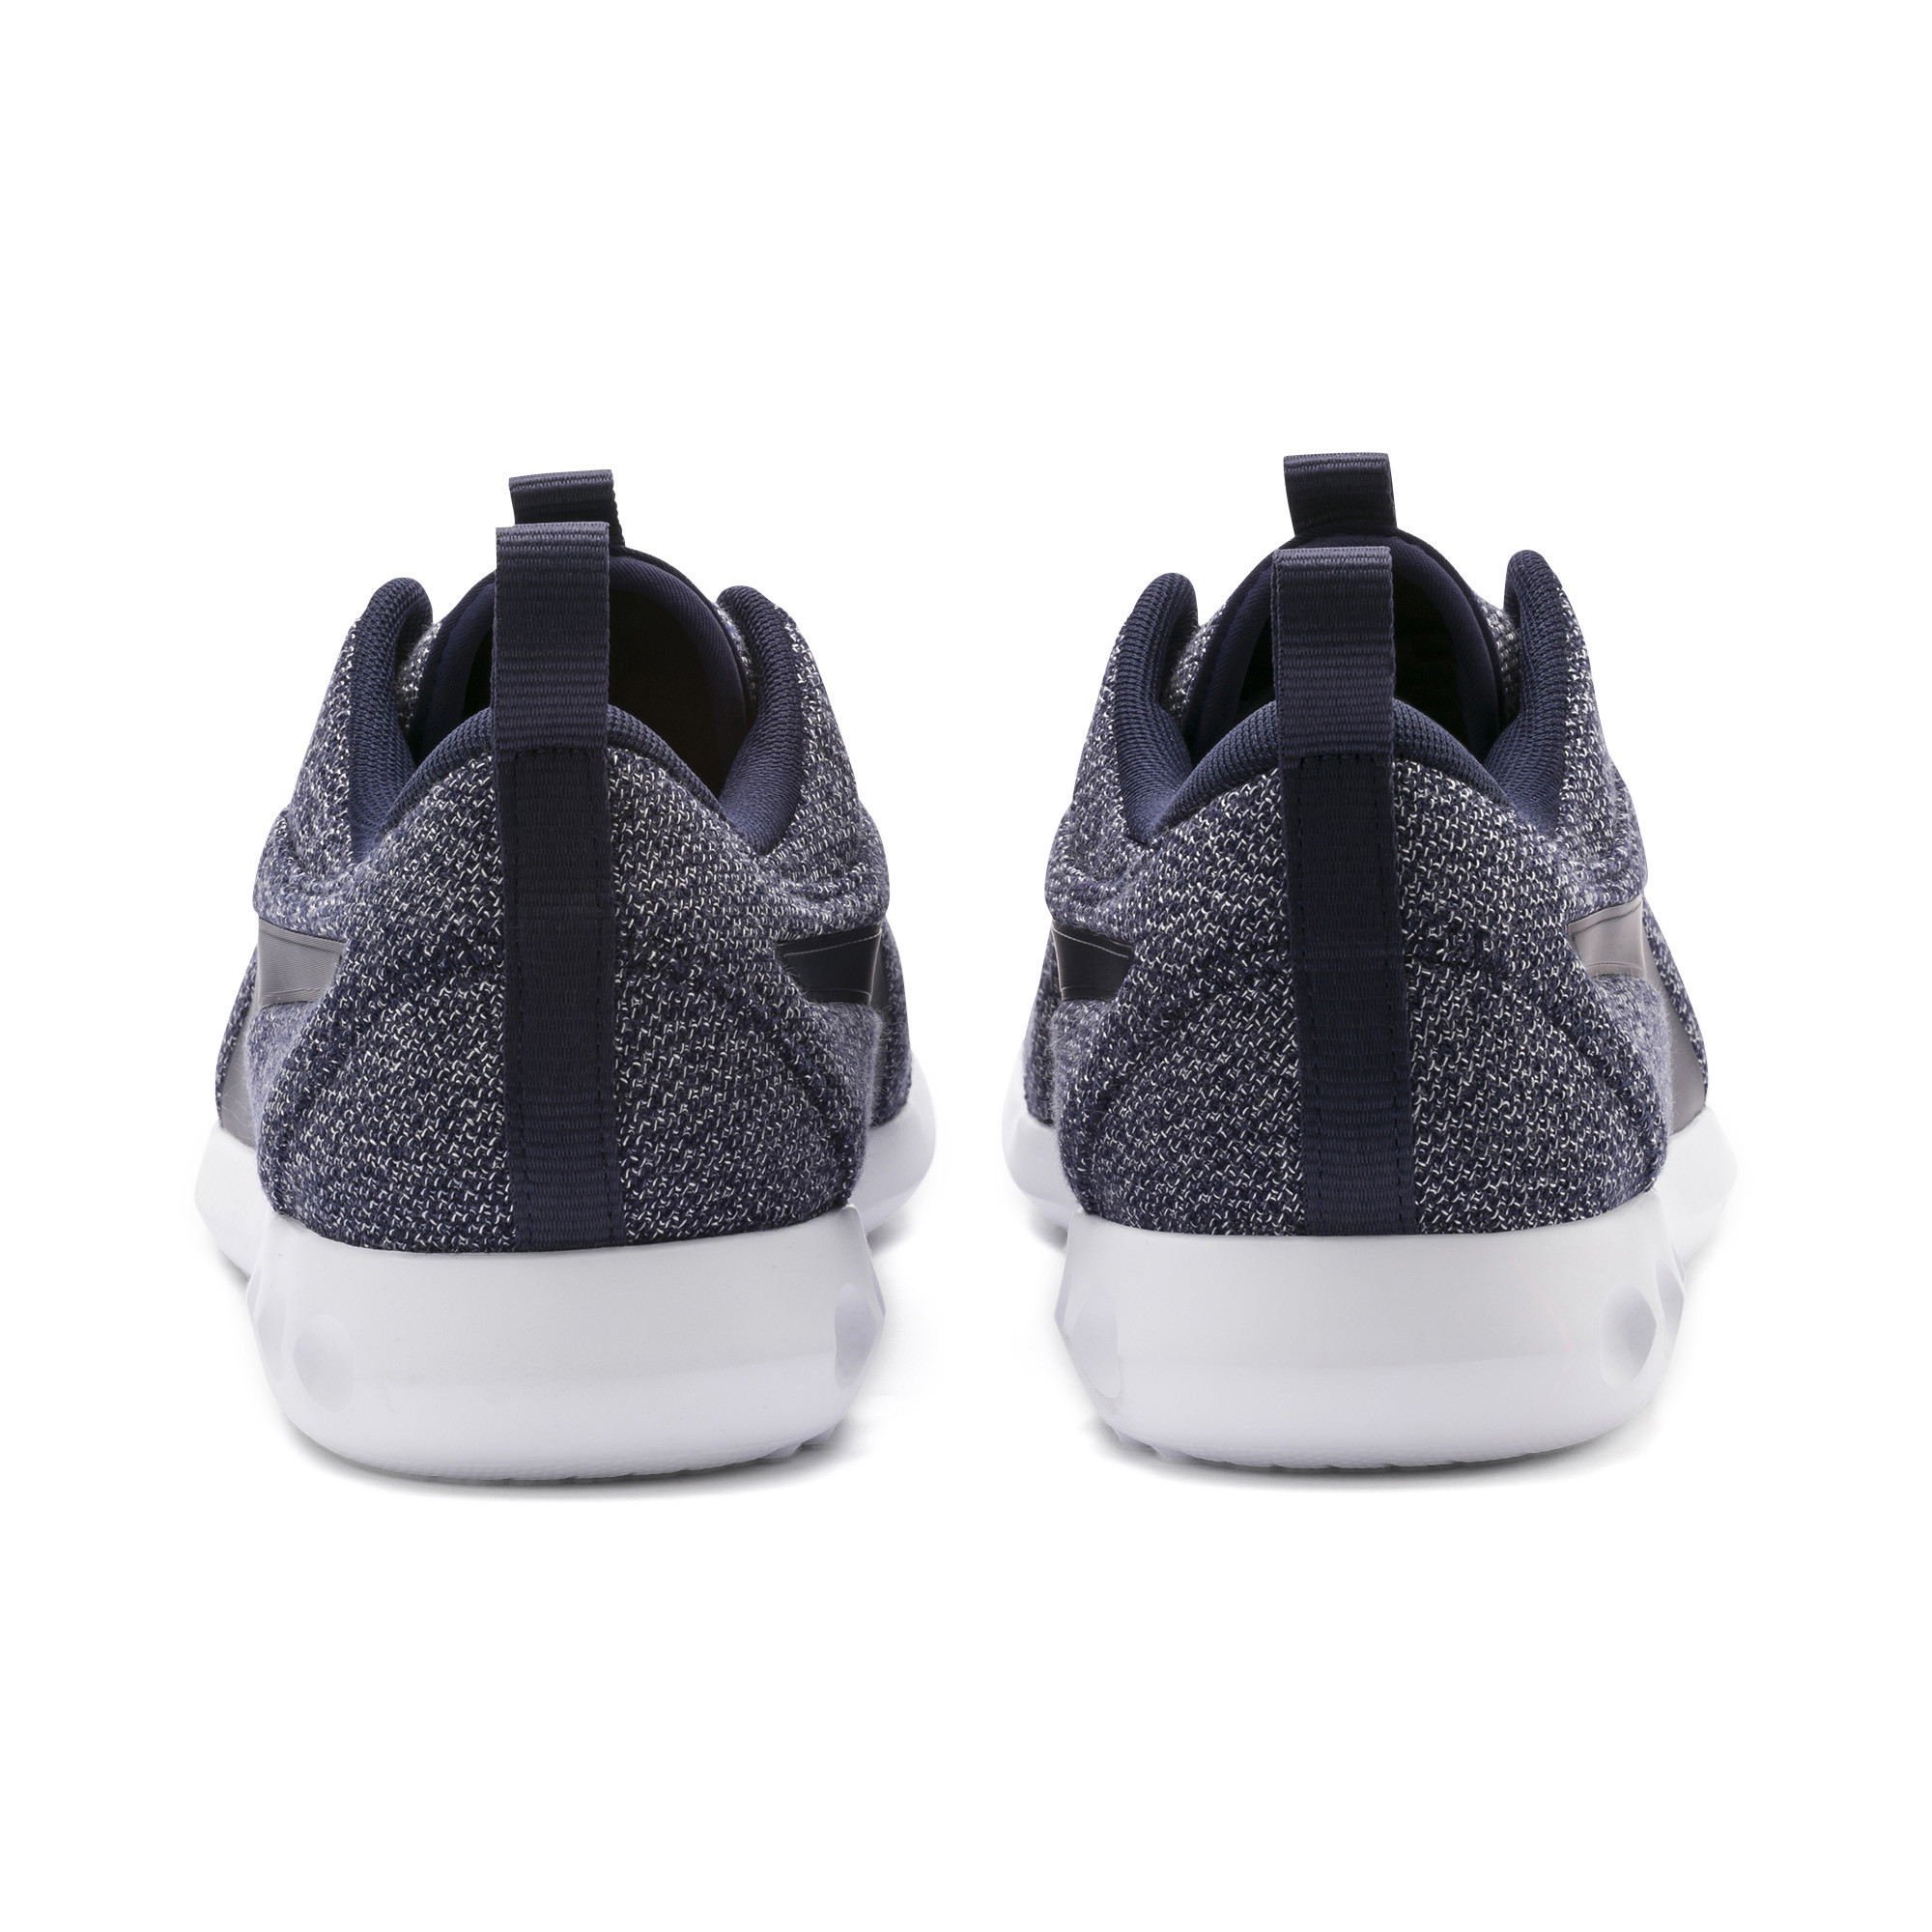 PUMA-Carson-2-Knit-Men-039-s-Training-Shoes-Men-Shoe-Running thumbnail 15